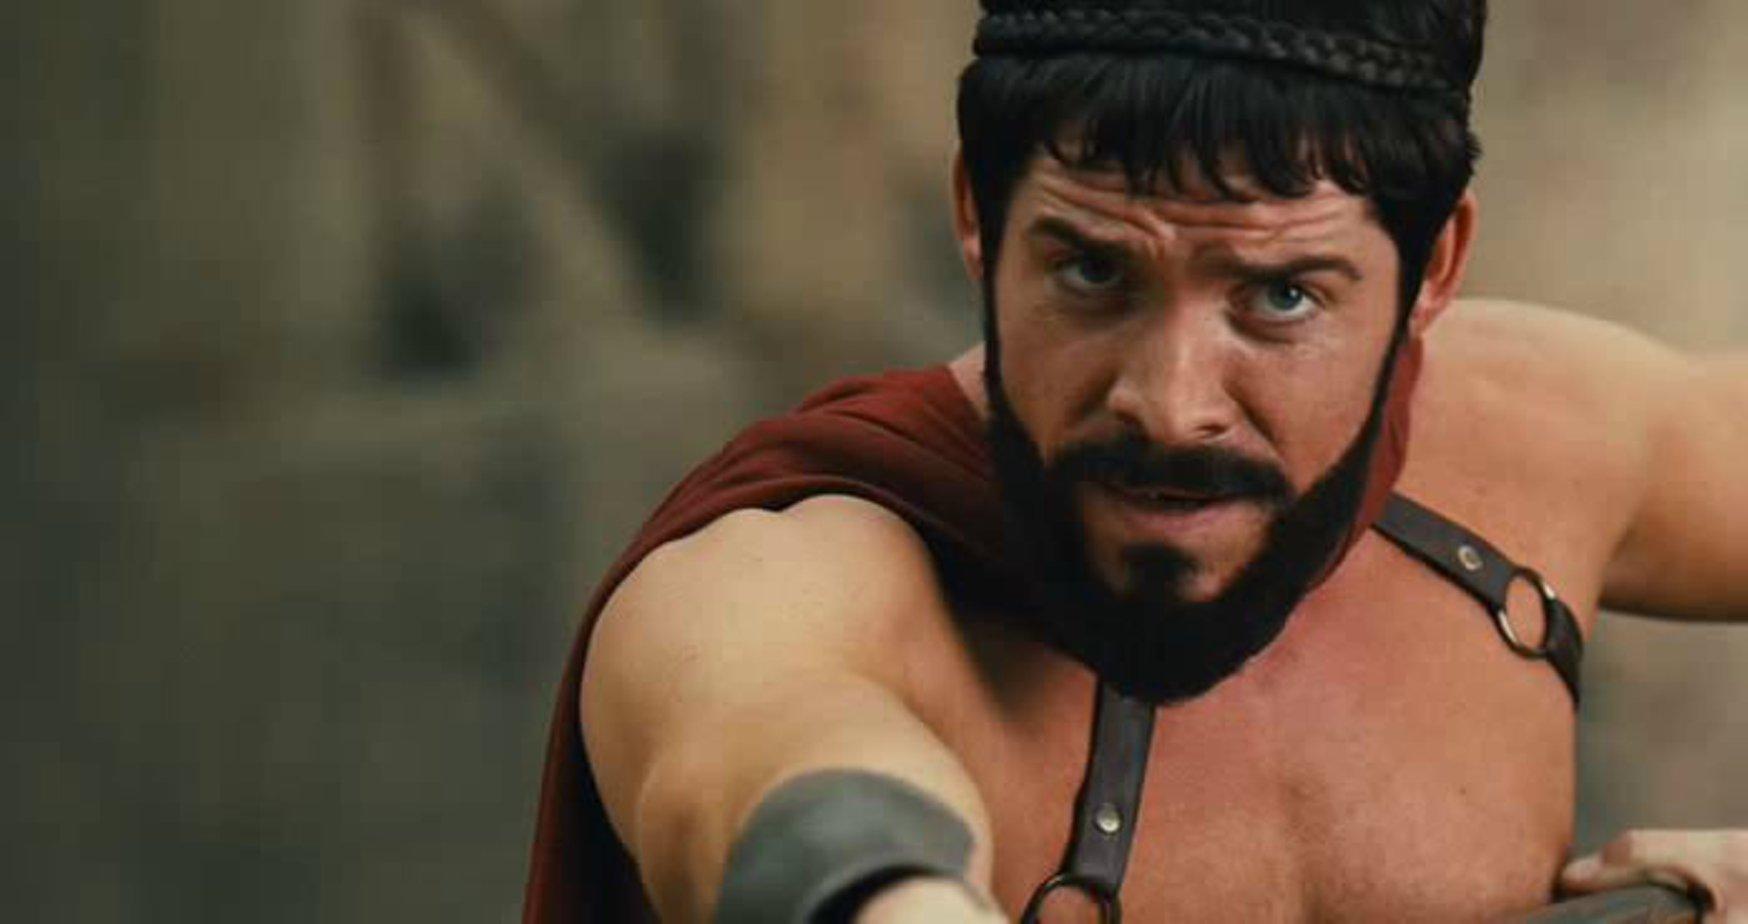 Знакомства со спартанцами смотреть онлайн